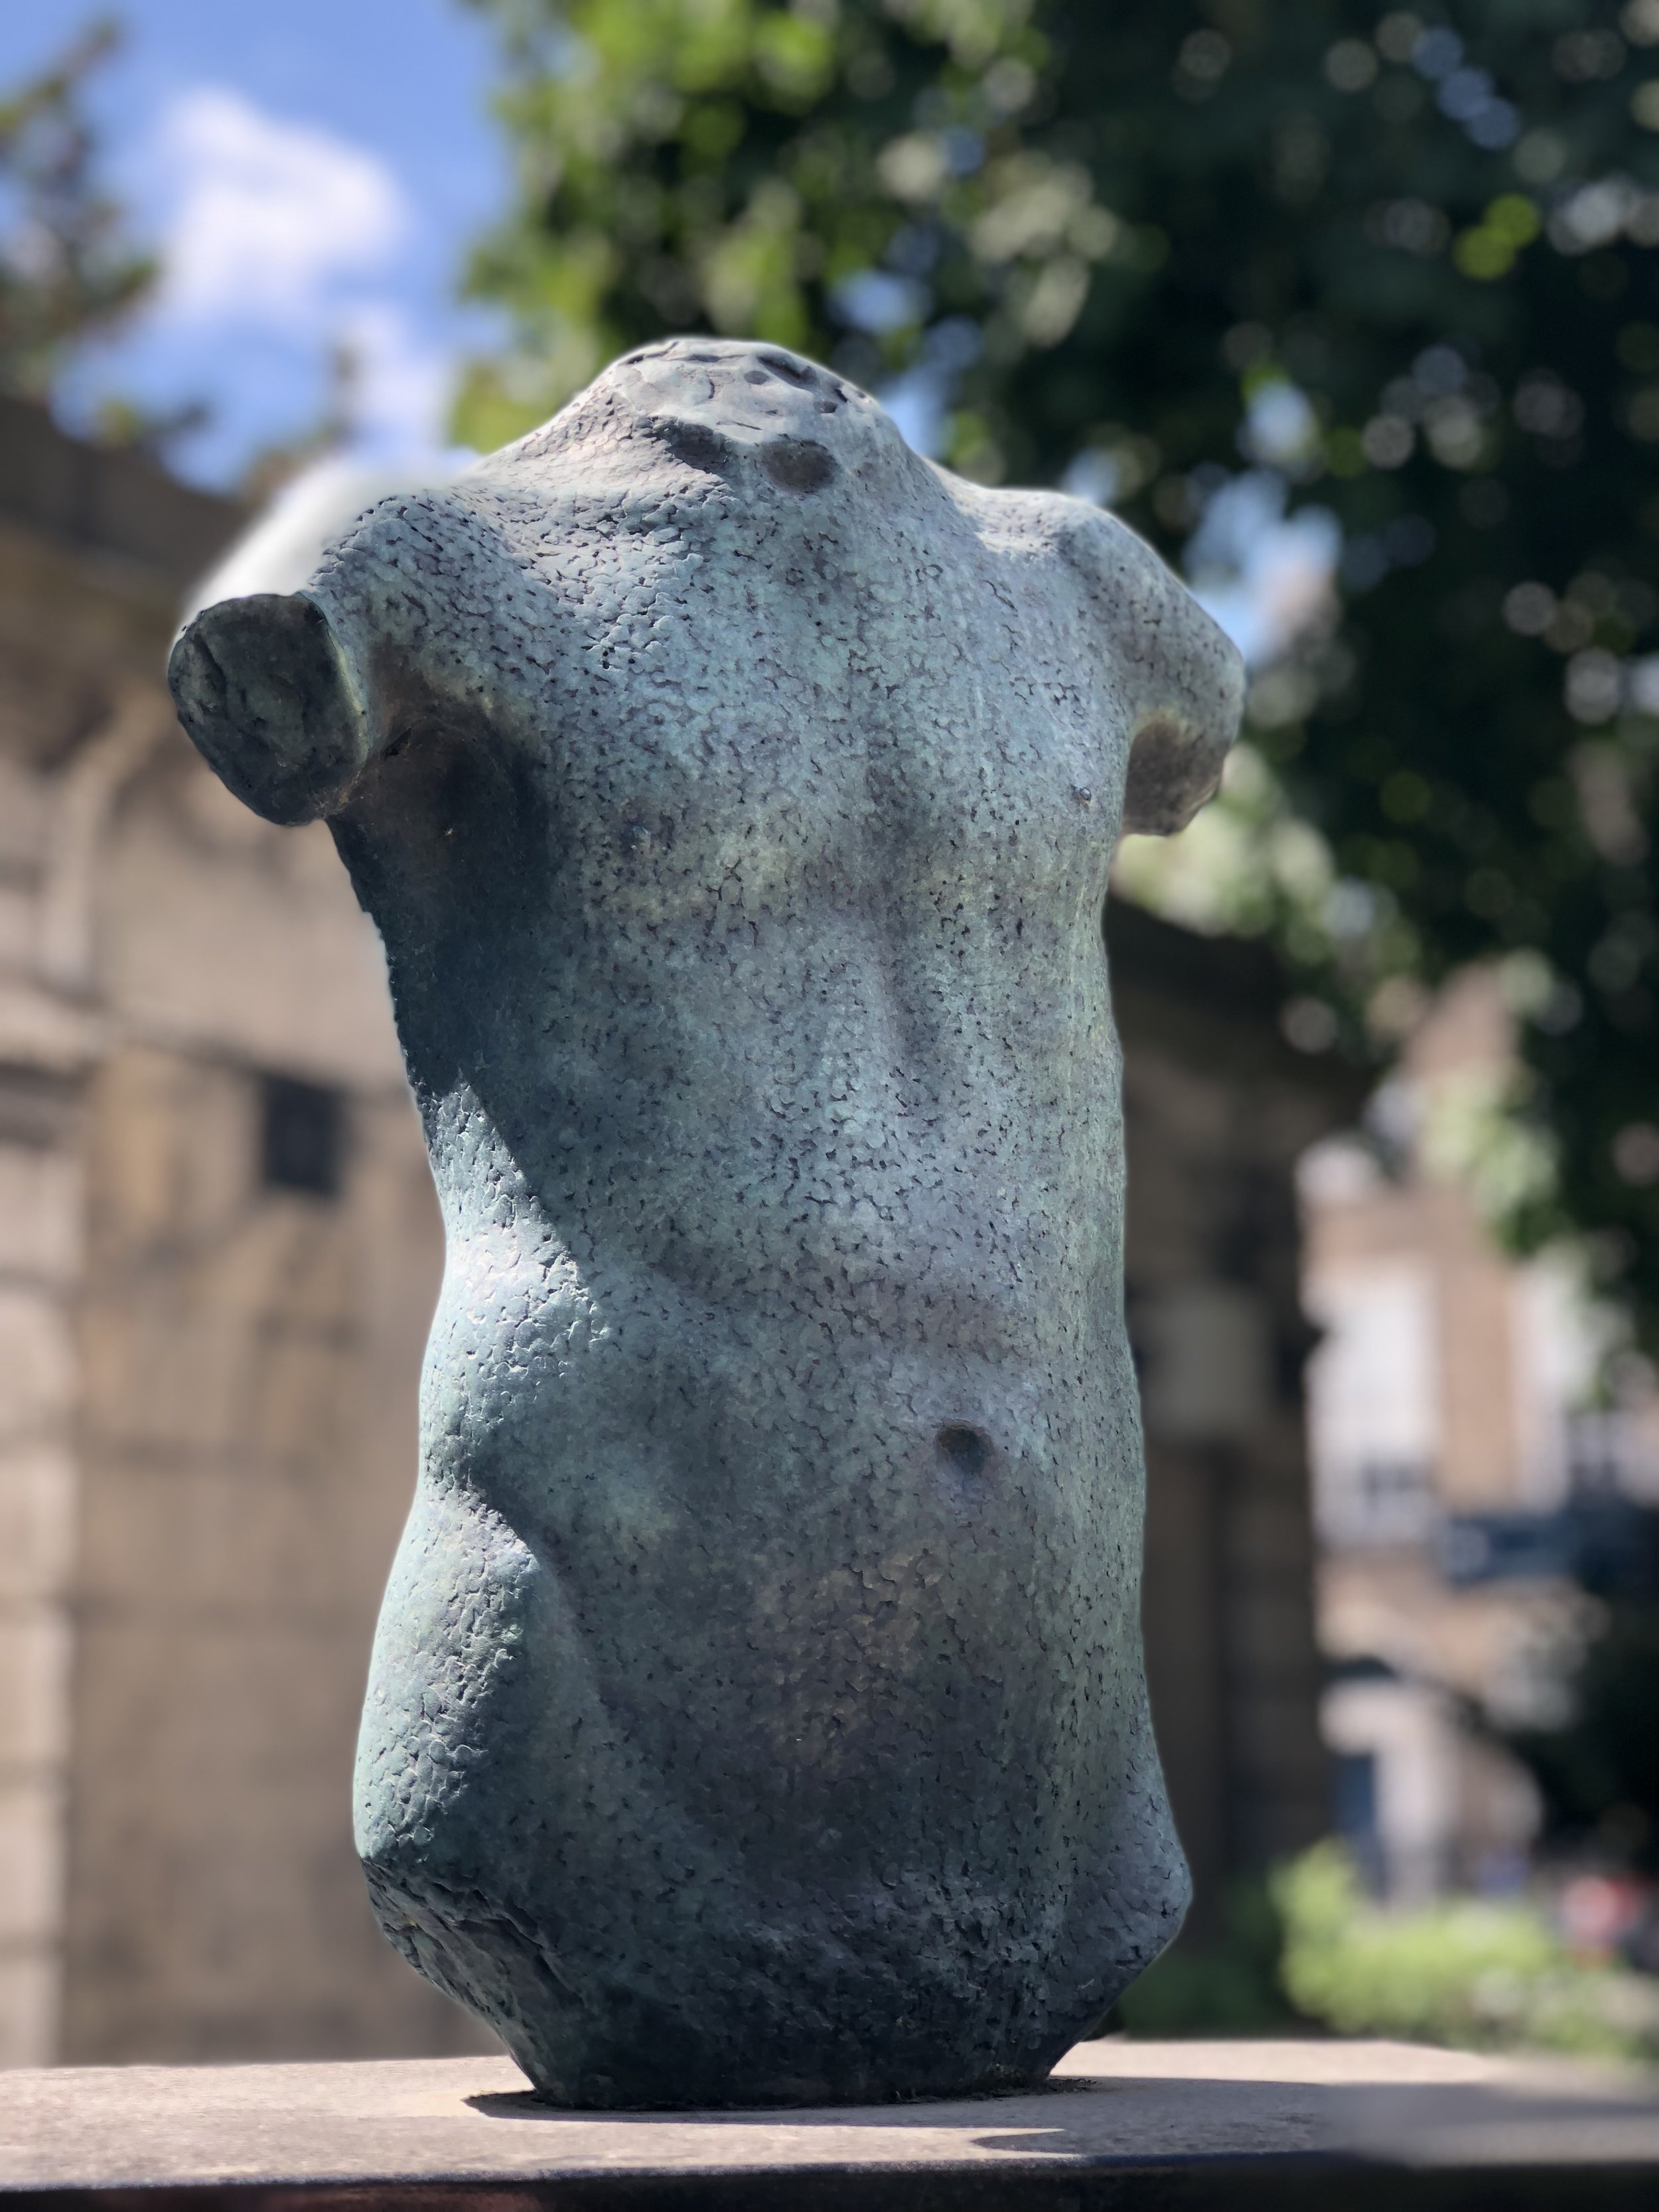 Statue in Merrion Square